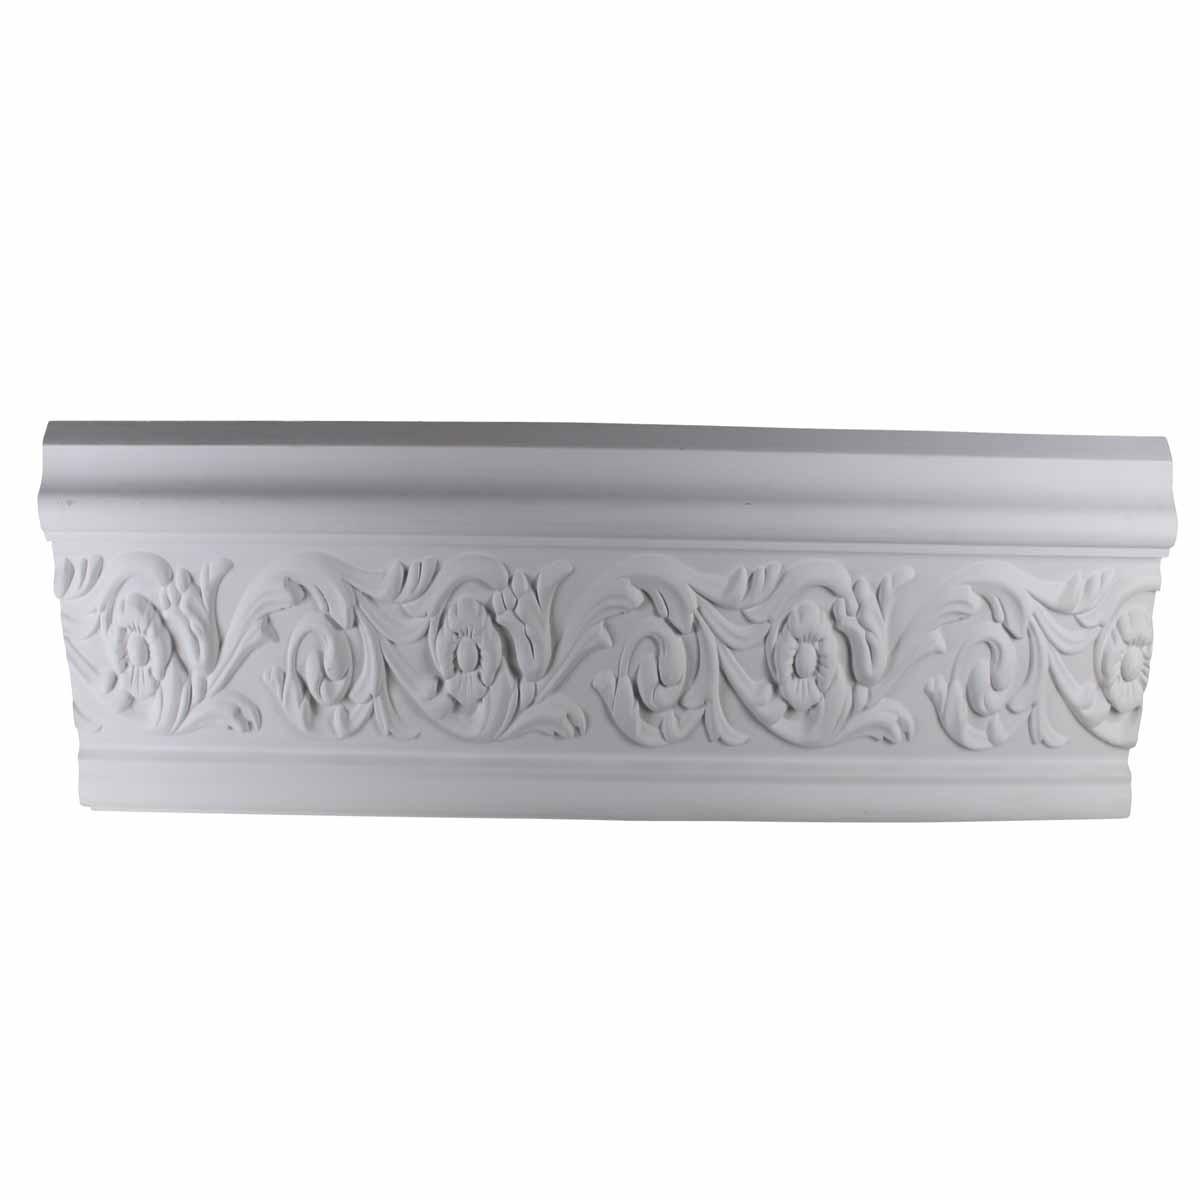 Cornice White Urethane Sample of 11657 23.5 Long Cornice Cornice Moulding Cornice Molding